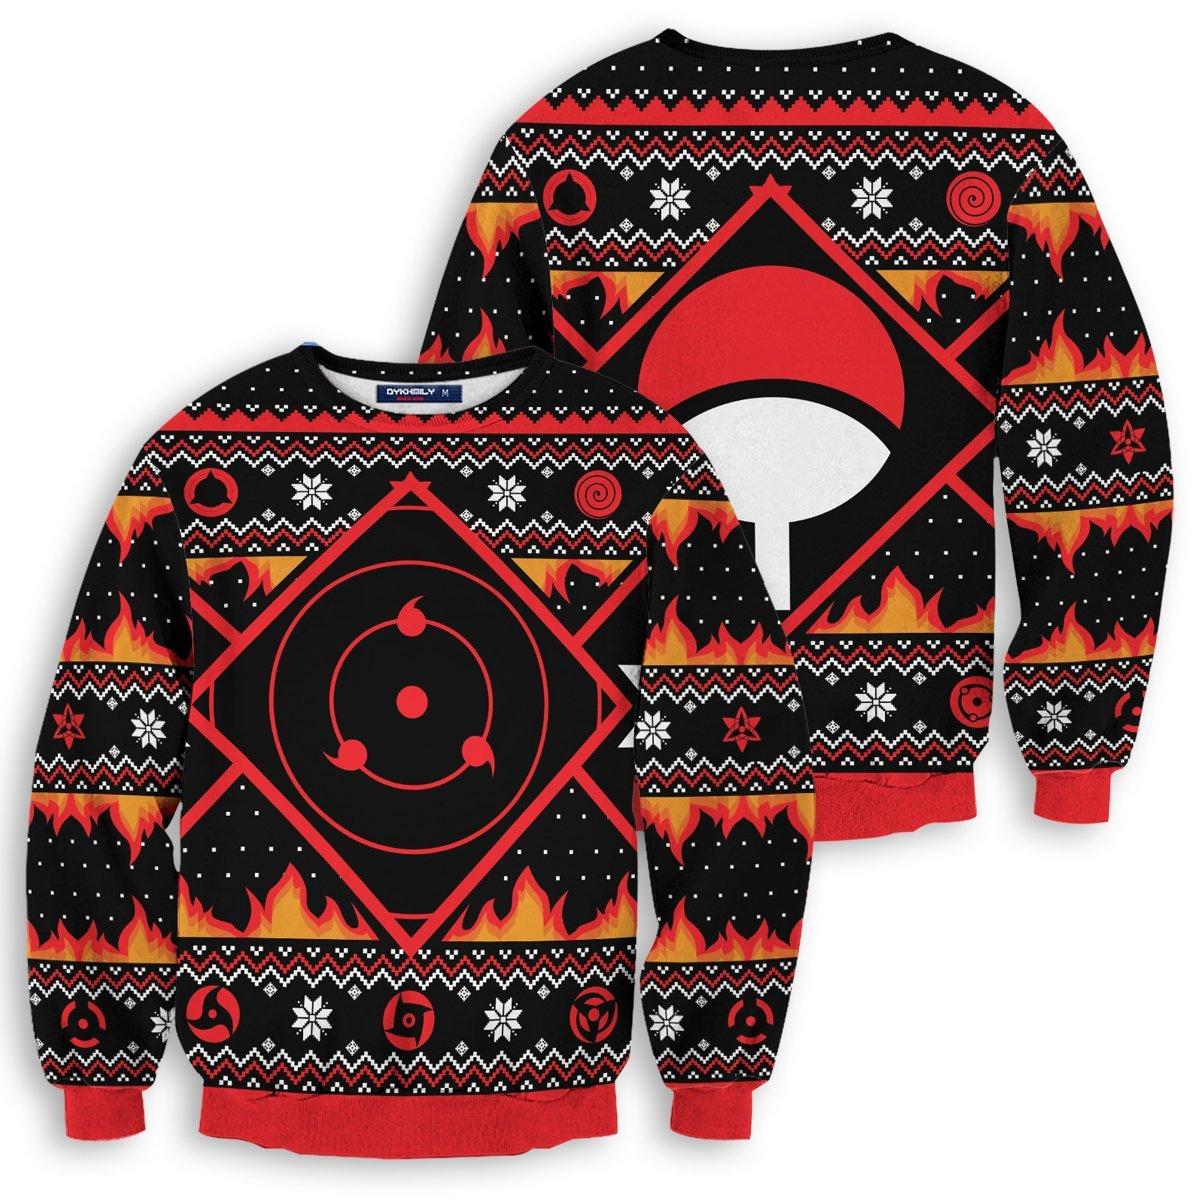 Uchiha Kekkei Genkai Unisex Wool Sweater FDM0310 S Official Otaku Treat Merch